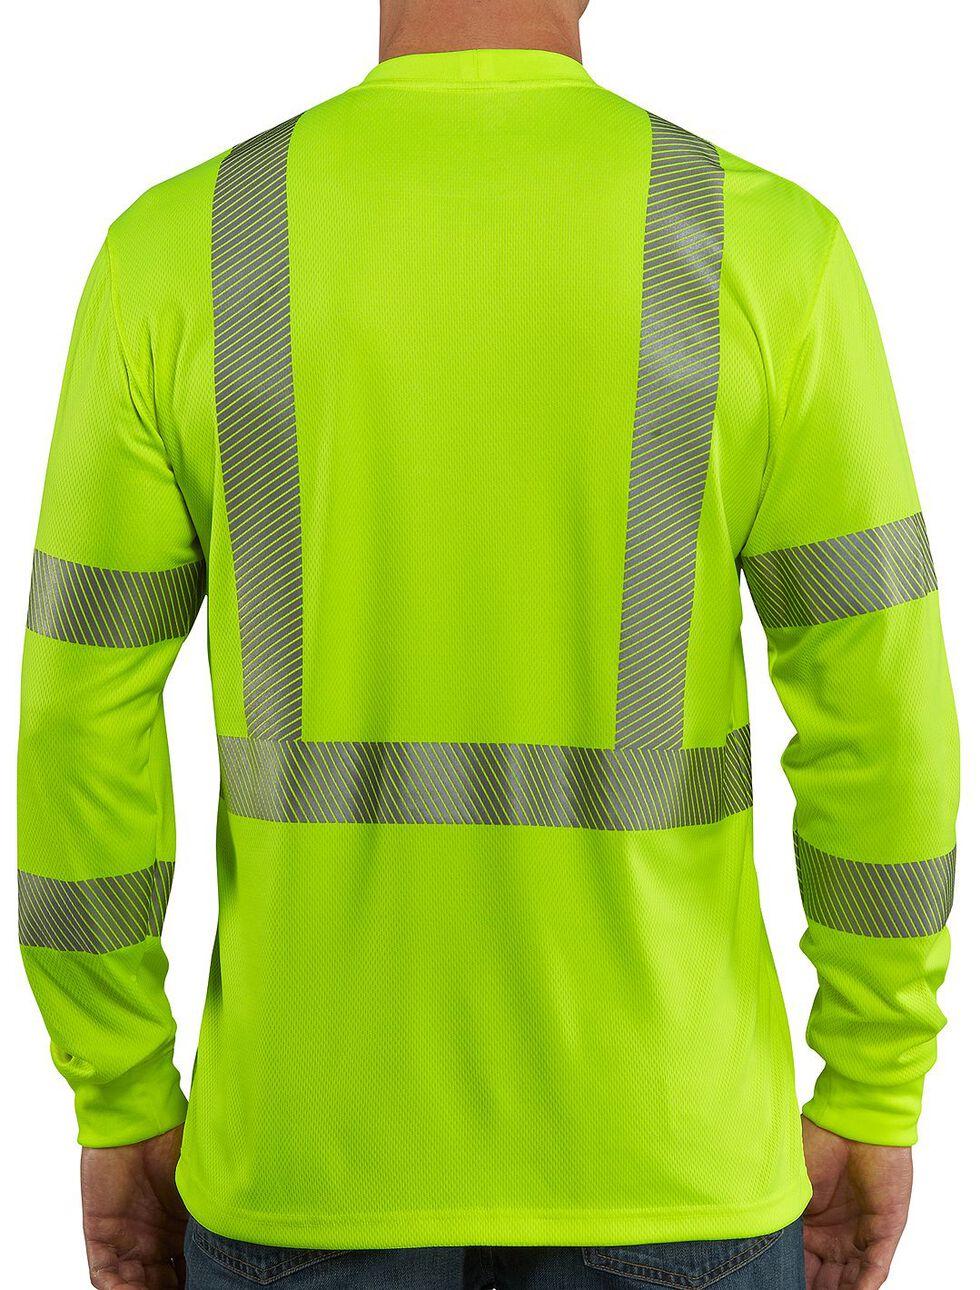 Carhartt Force High-Visibilty Class 3 Long Sleeve T-Shirt - Big & Tall, Lime, hi-res